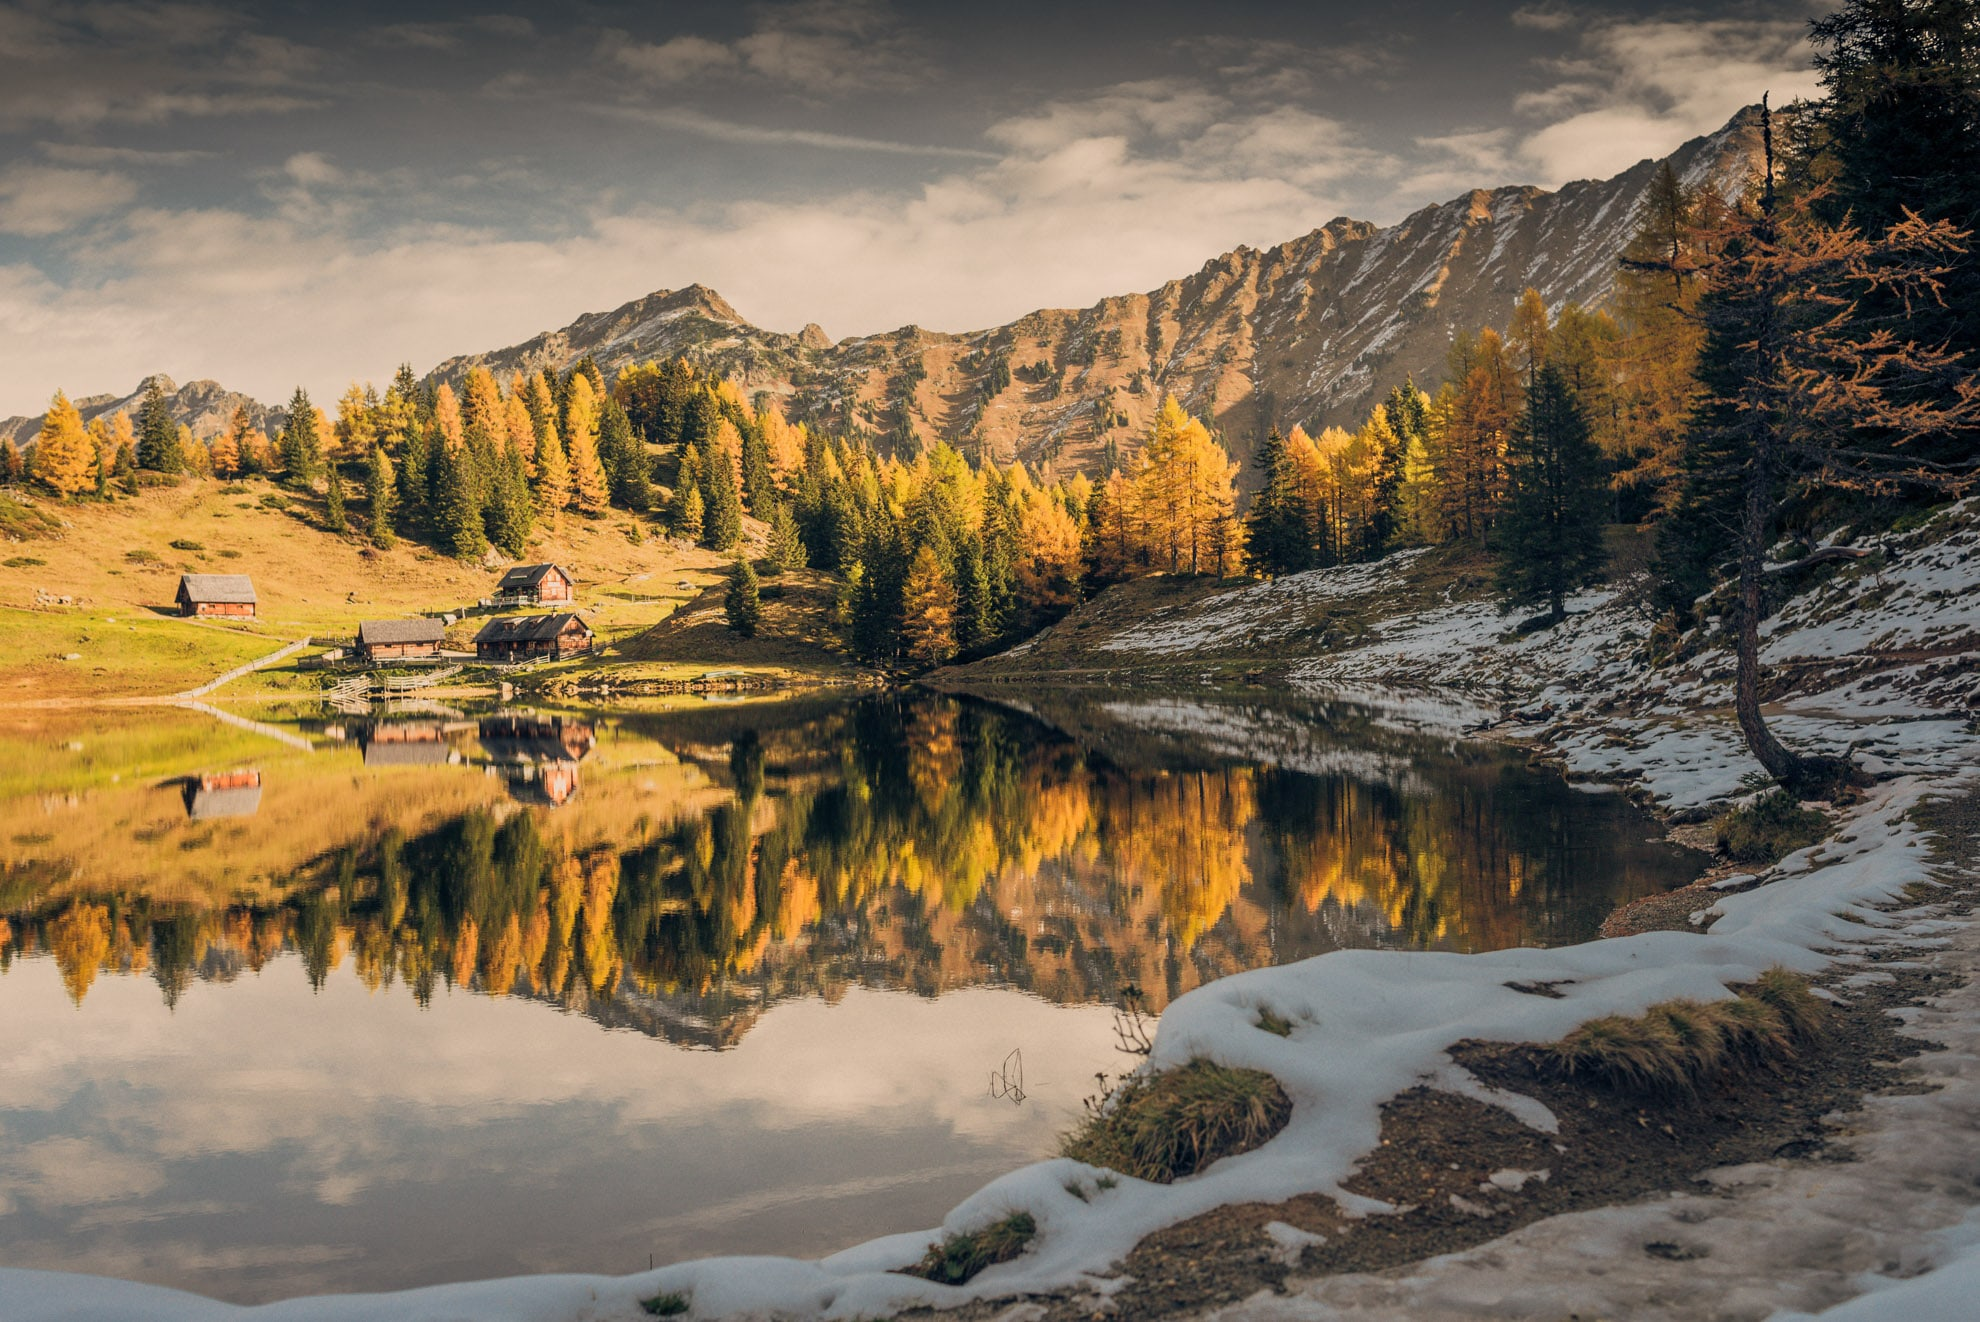 Naturfotografie-16-min.jpg